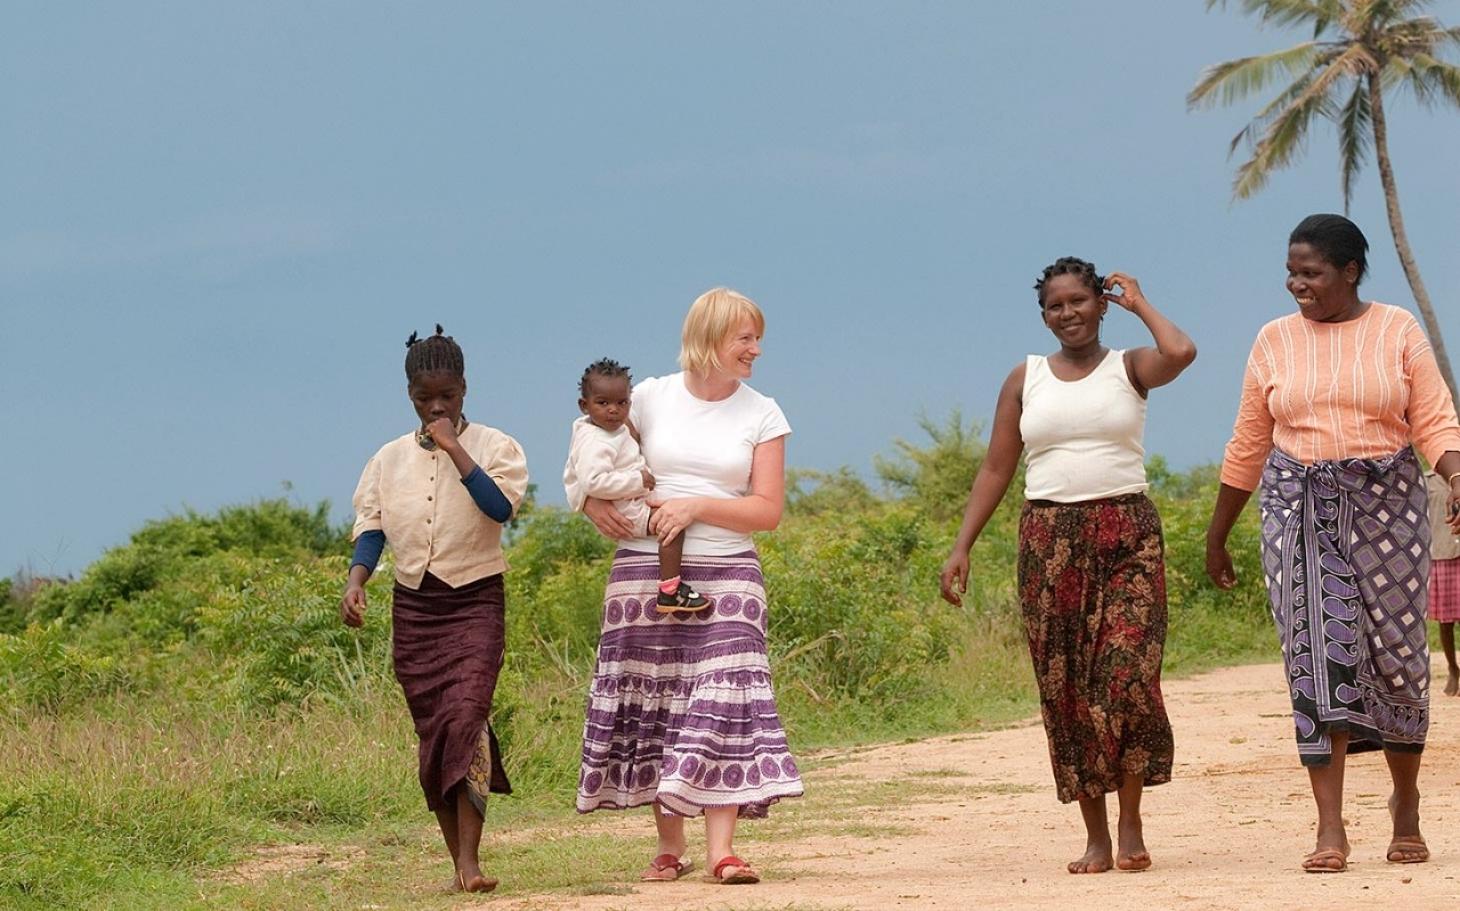 http://america.aljazeera.com/content/ajam/opinions/2014/4/volunter-tourismwhitevoluntouristsafricaaidsorphans/jcr:content/headlineImage.adapt.1460.high.tourists_burden_042114.1398167532714.jpg